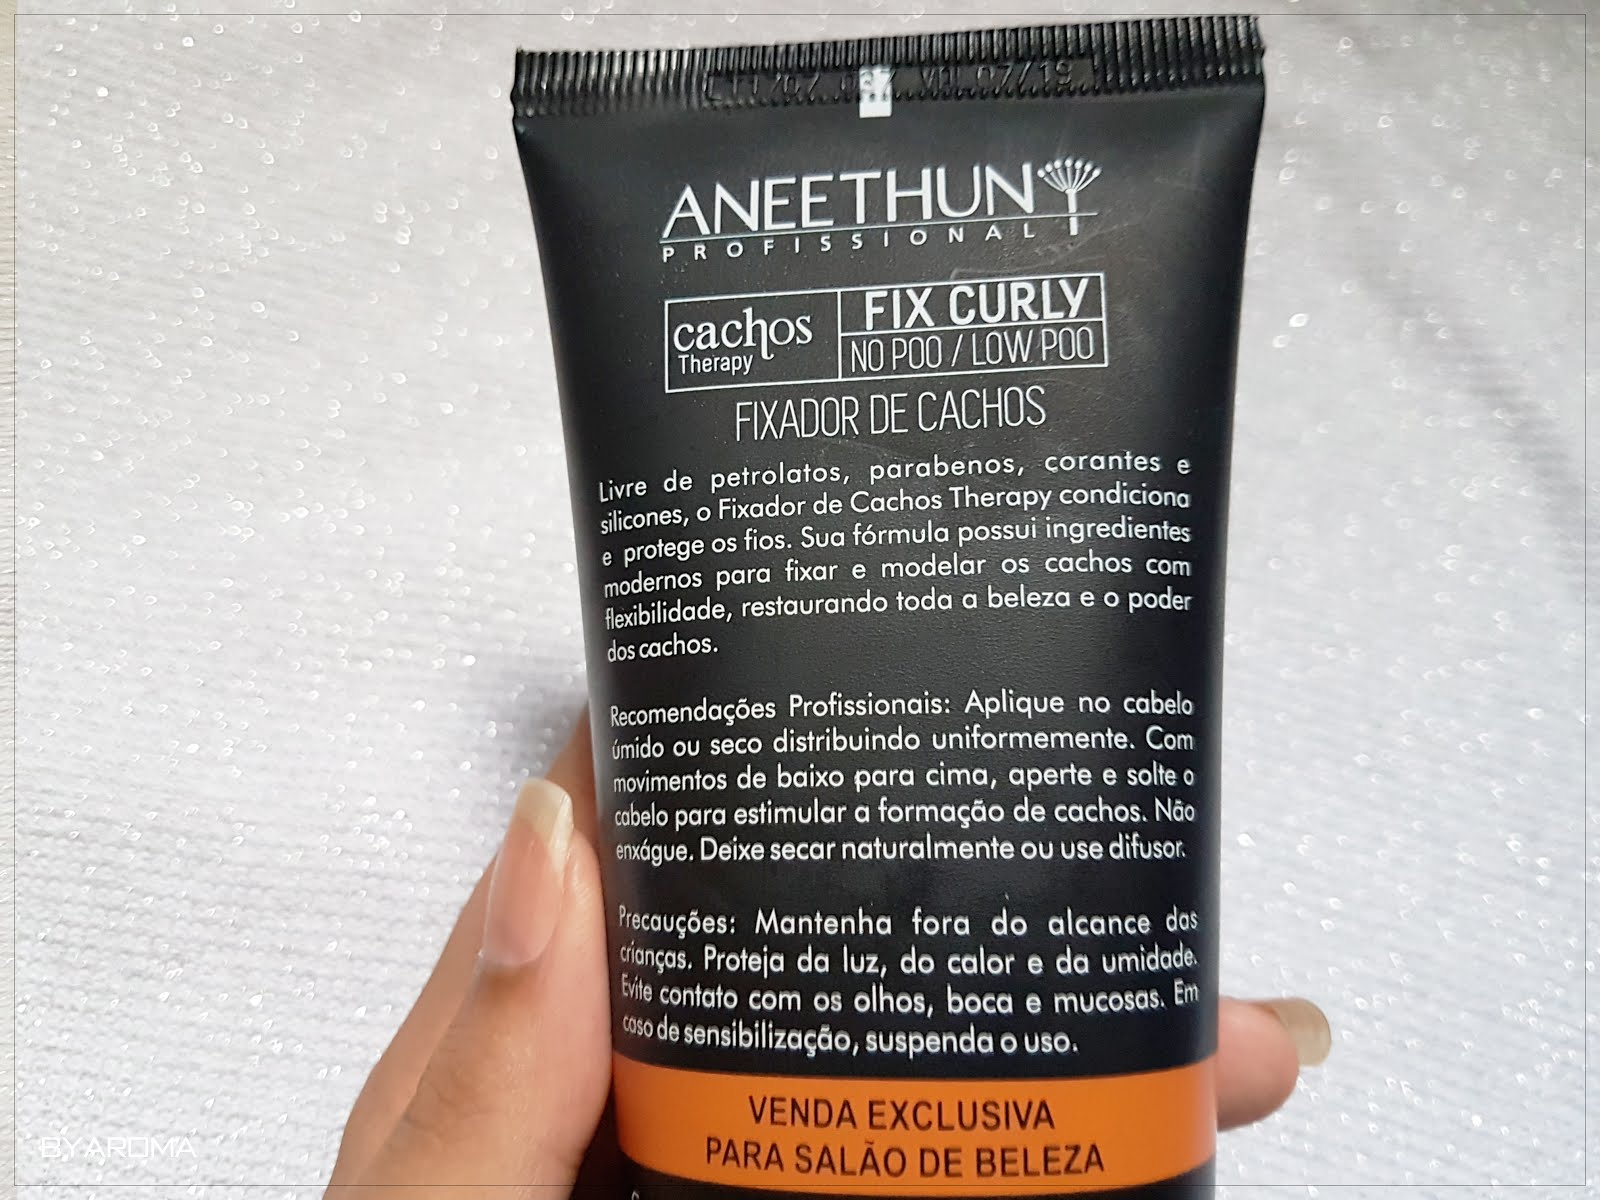 Fix Curly Fixador de Cachos Aneethun Cachos therapy